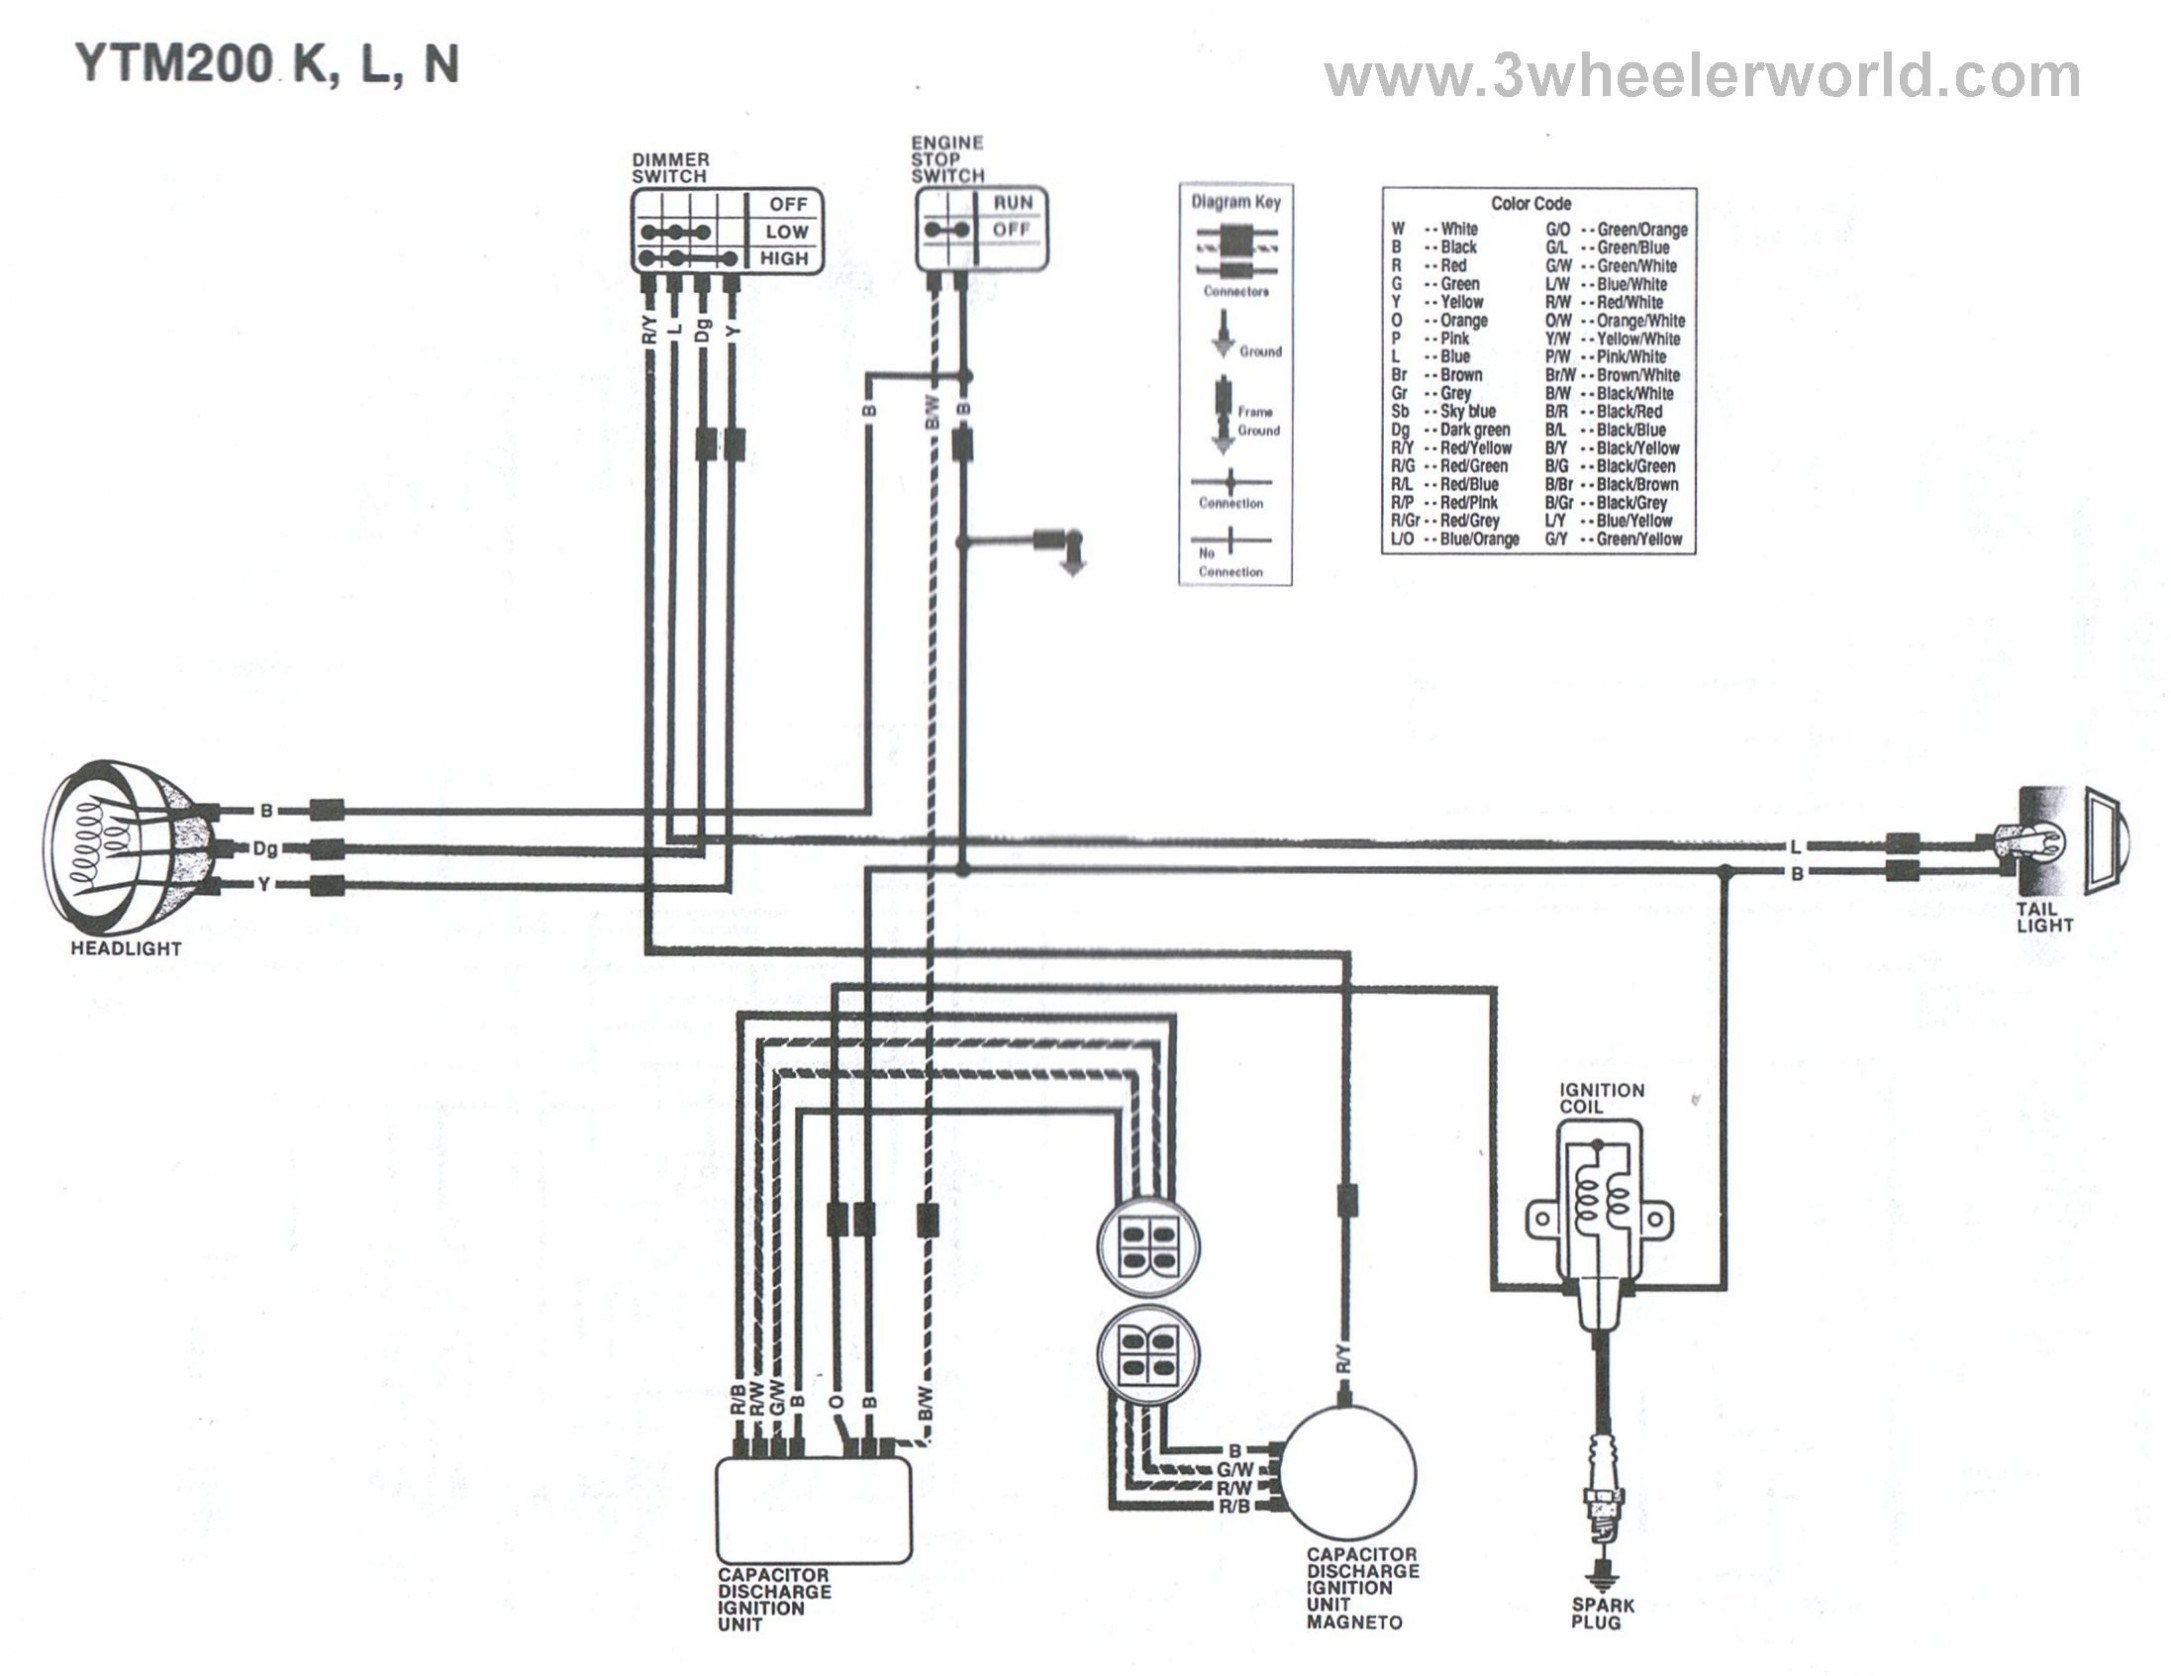 1998 Yamaha Blaster Wiring Diagram - Wiring Diagram Direct jagged-tiger -  jagged-tiger.siciliabeb.it | 98 Blaster Wiring Diagram |  | jagged-tiger.siciliabeb.it